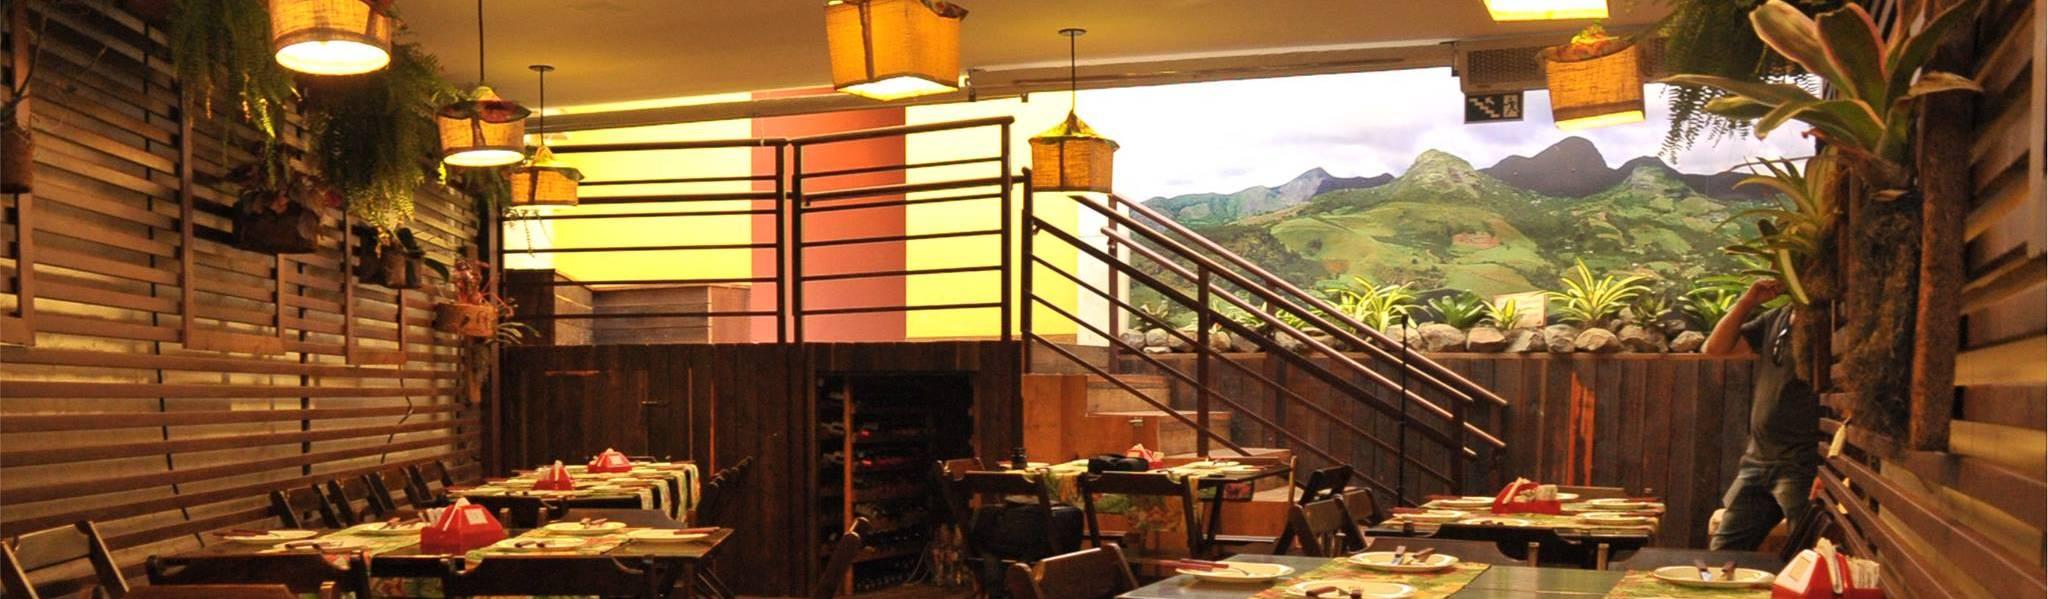 Anelisy Lima Arquitetura e Design